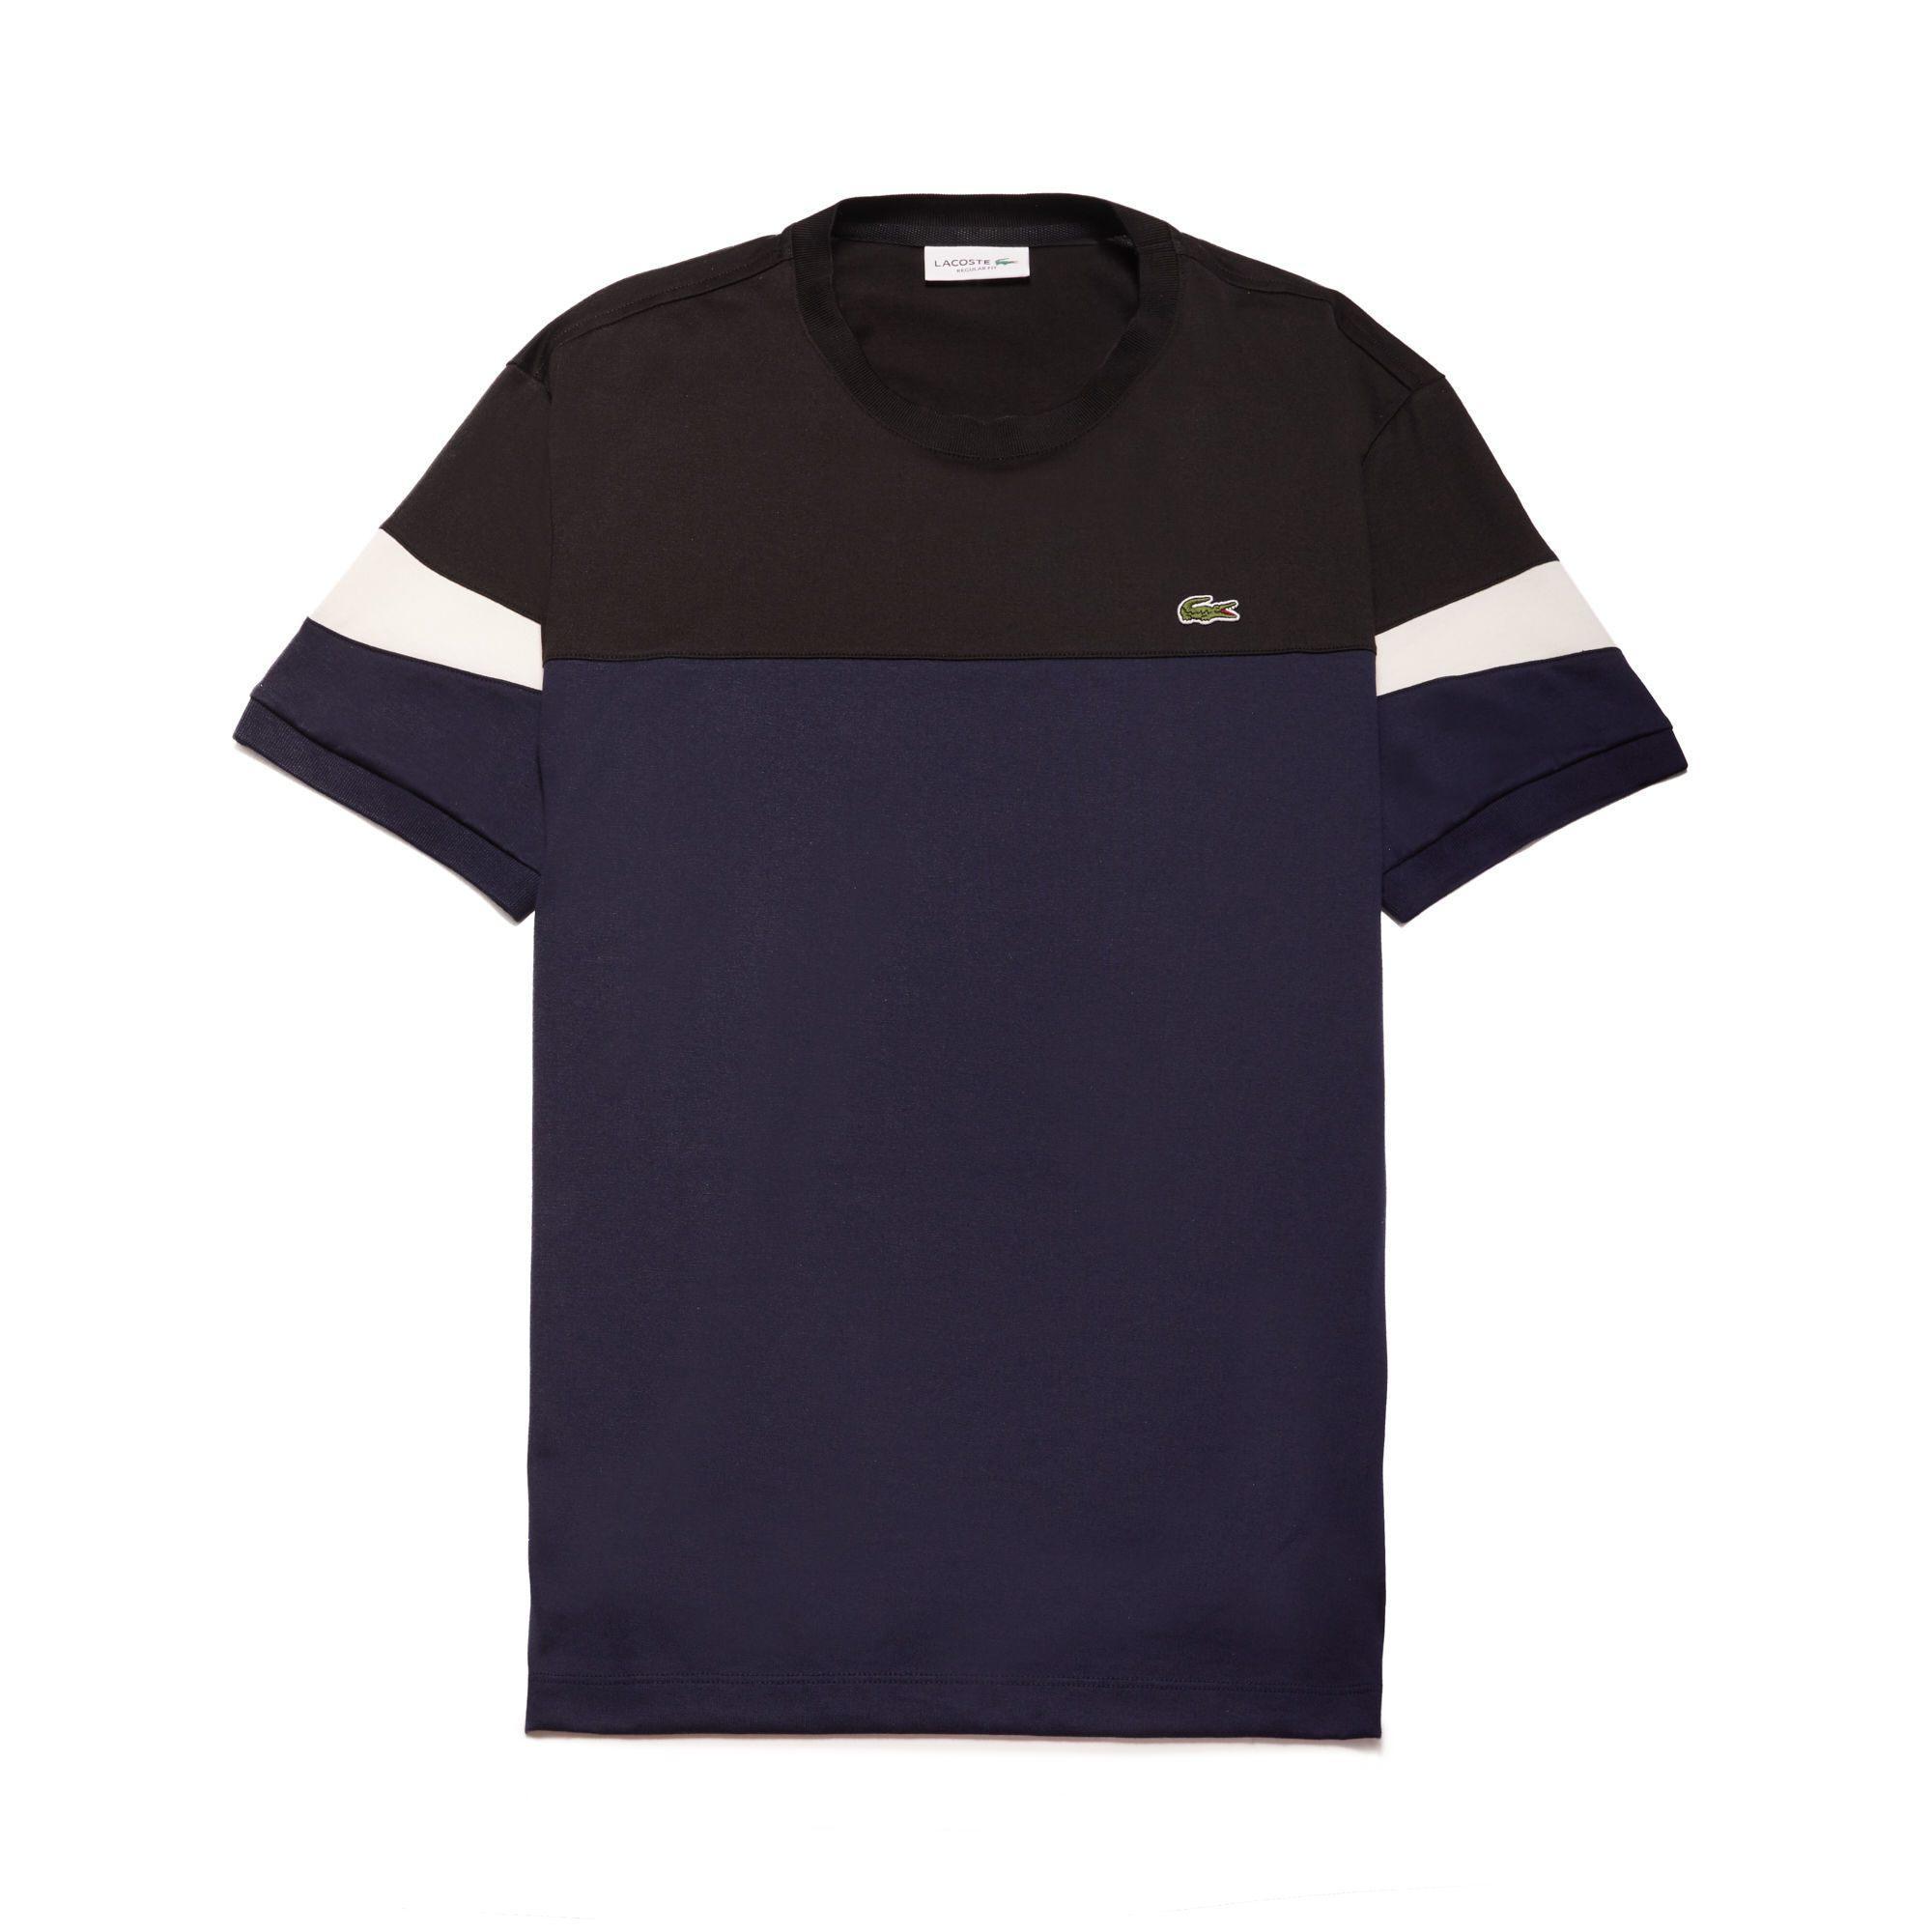 Lacoste Men's Crew Neck Colorblock Soft Jersey T-shirt In Navy Blue / Black / White